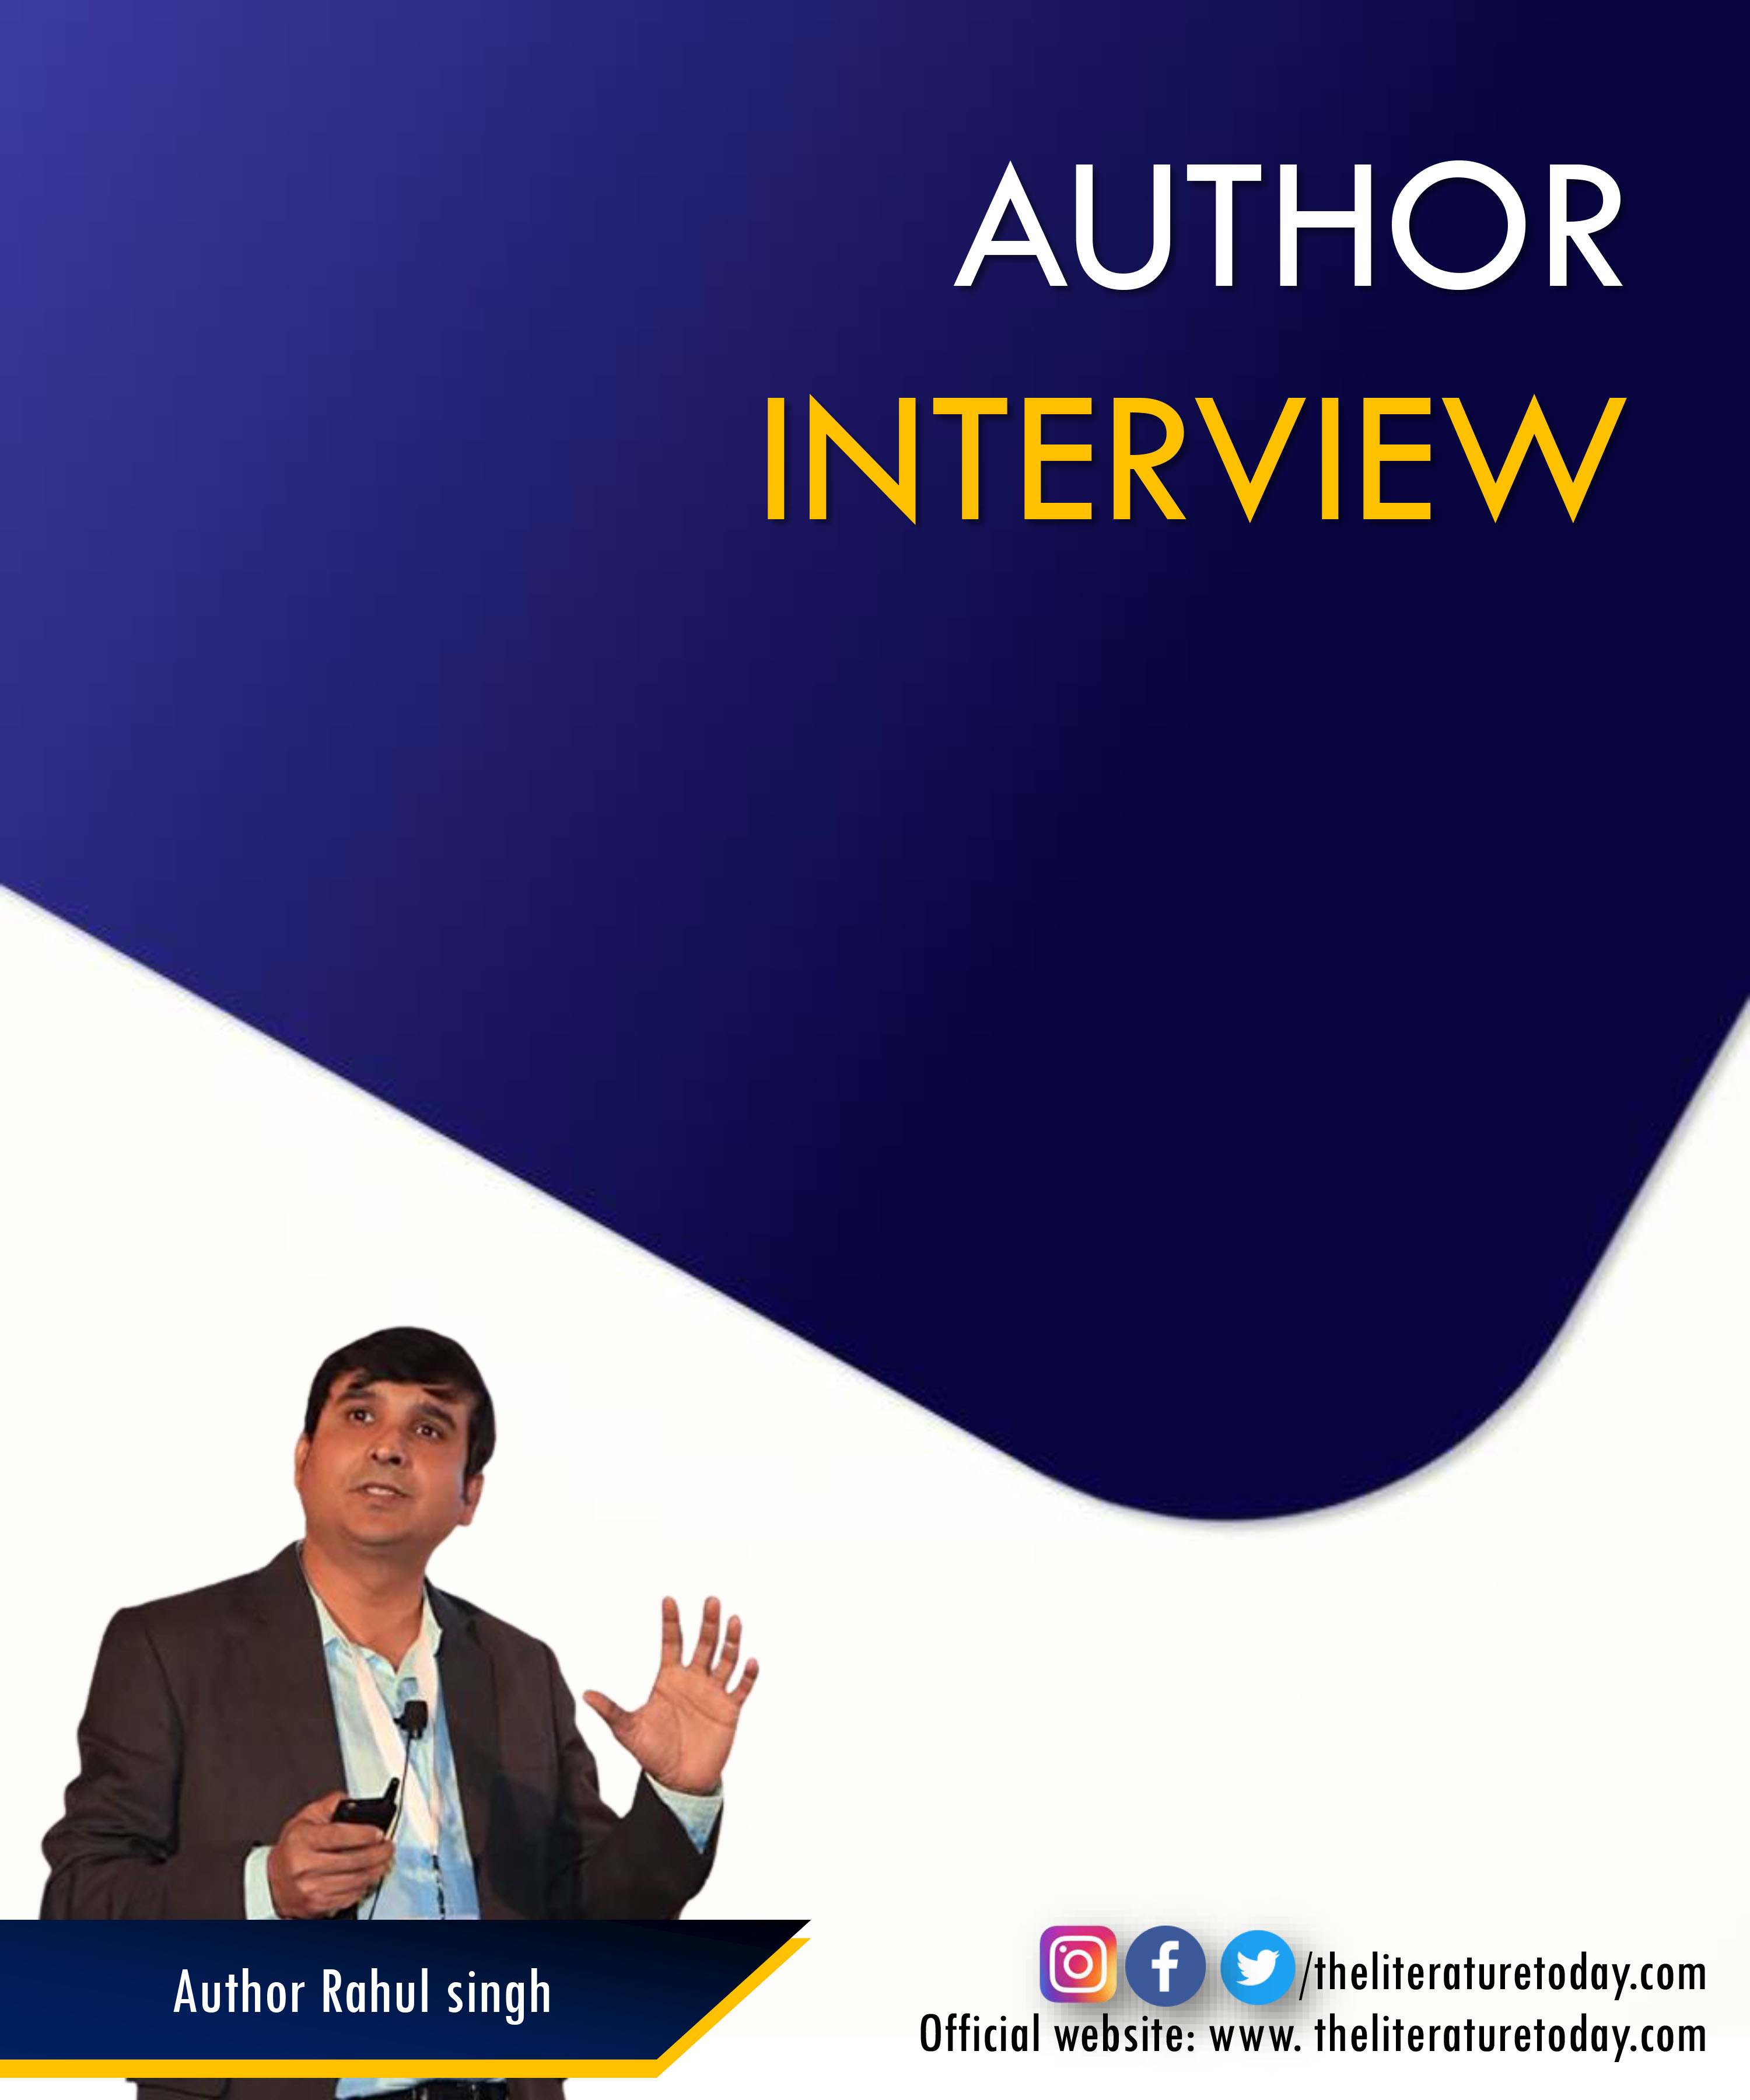 Author Interview | Rahul singh | Evincepub Publishing